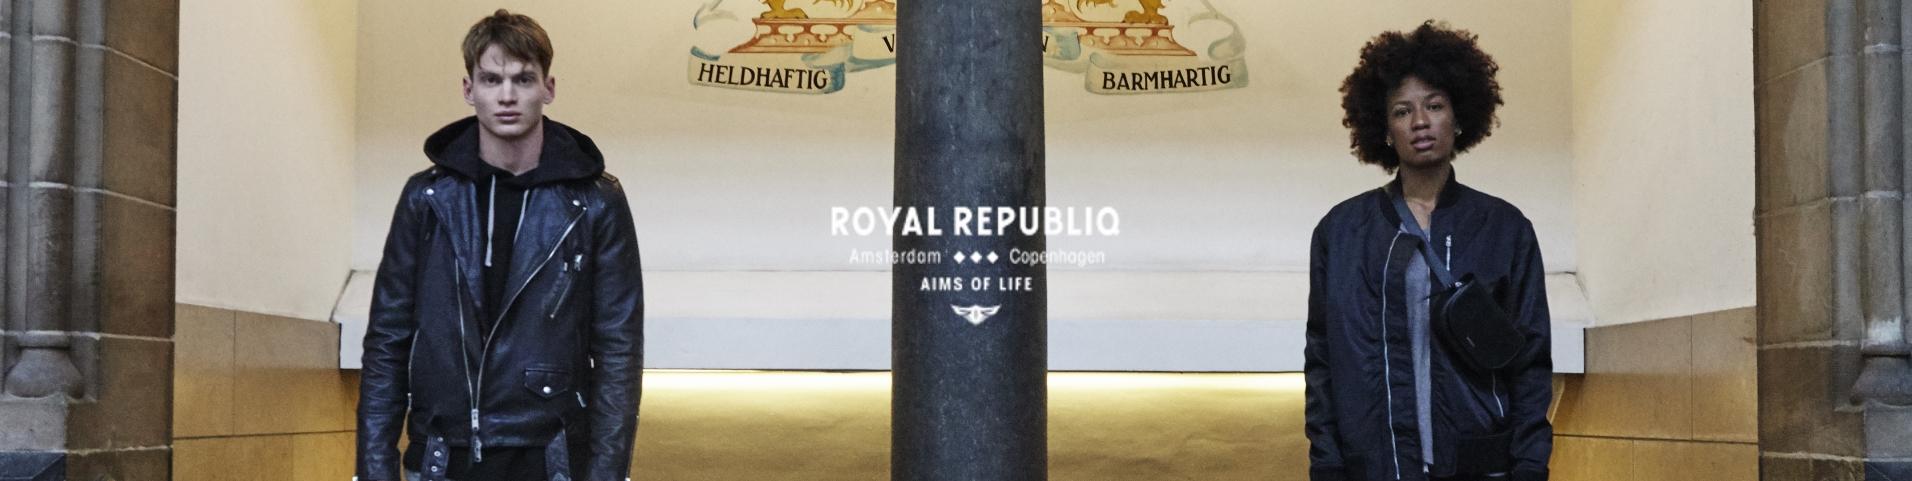 94773682dab5 SALE! Jetzt die besten Royal RepubliQ Sale Angebote shoppen